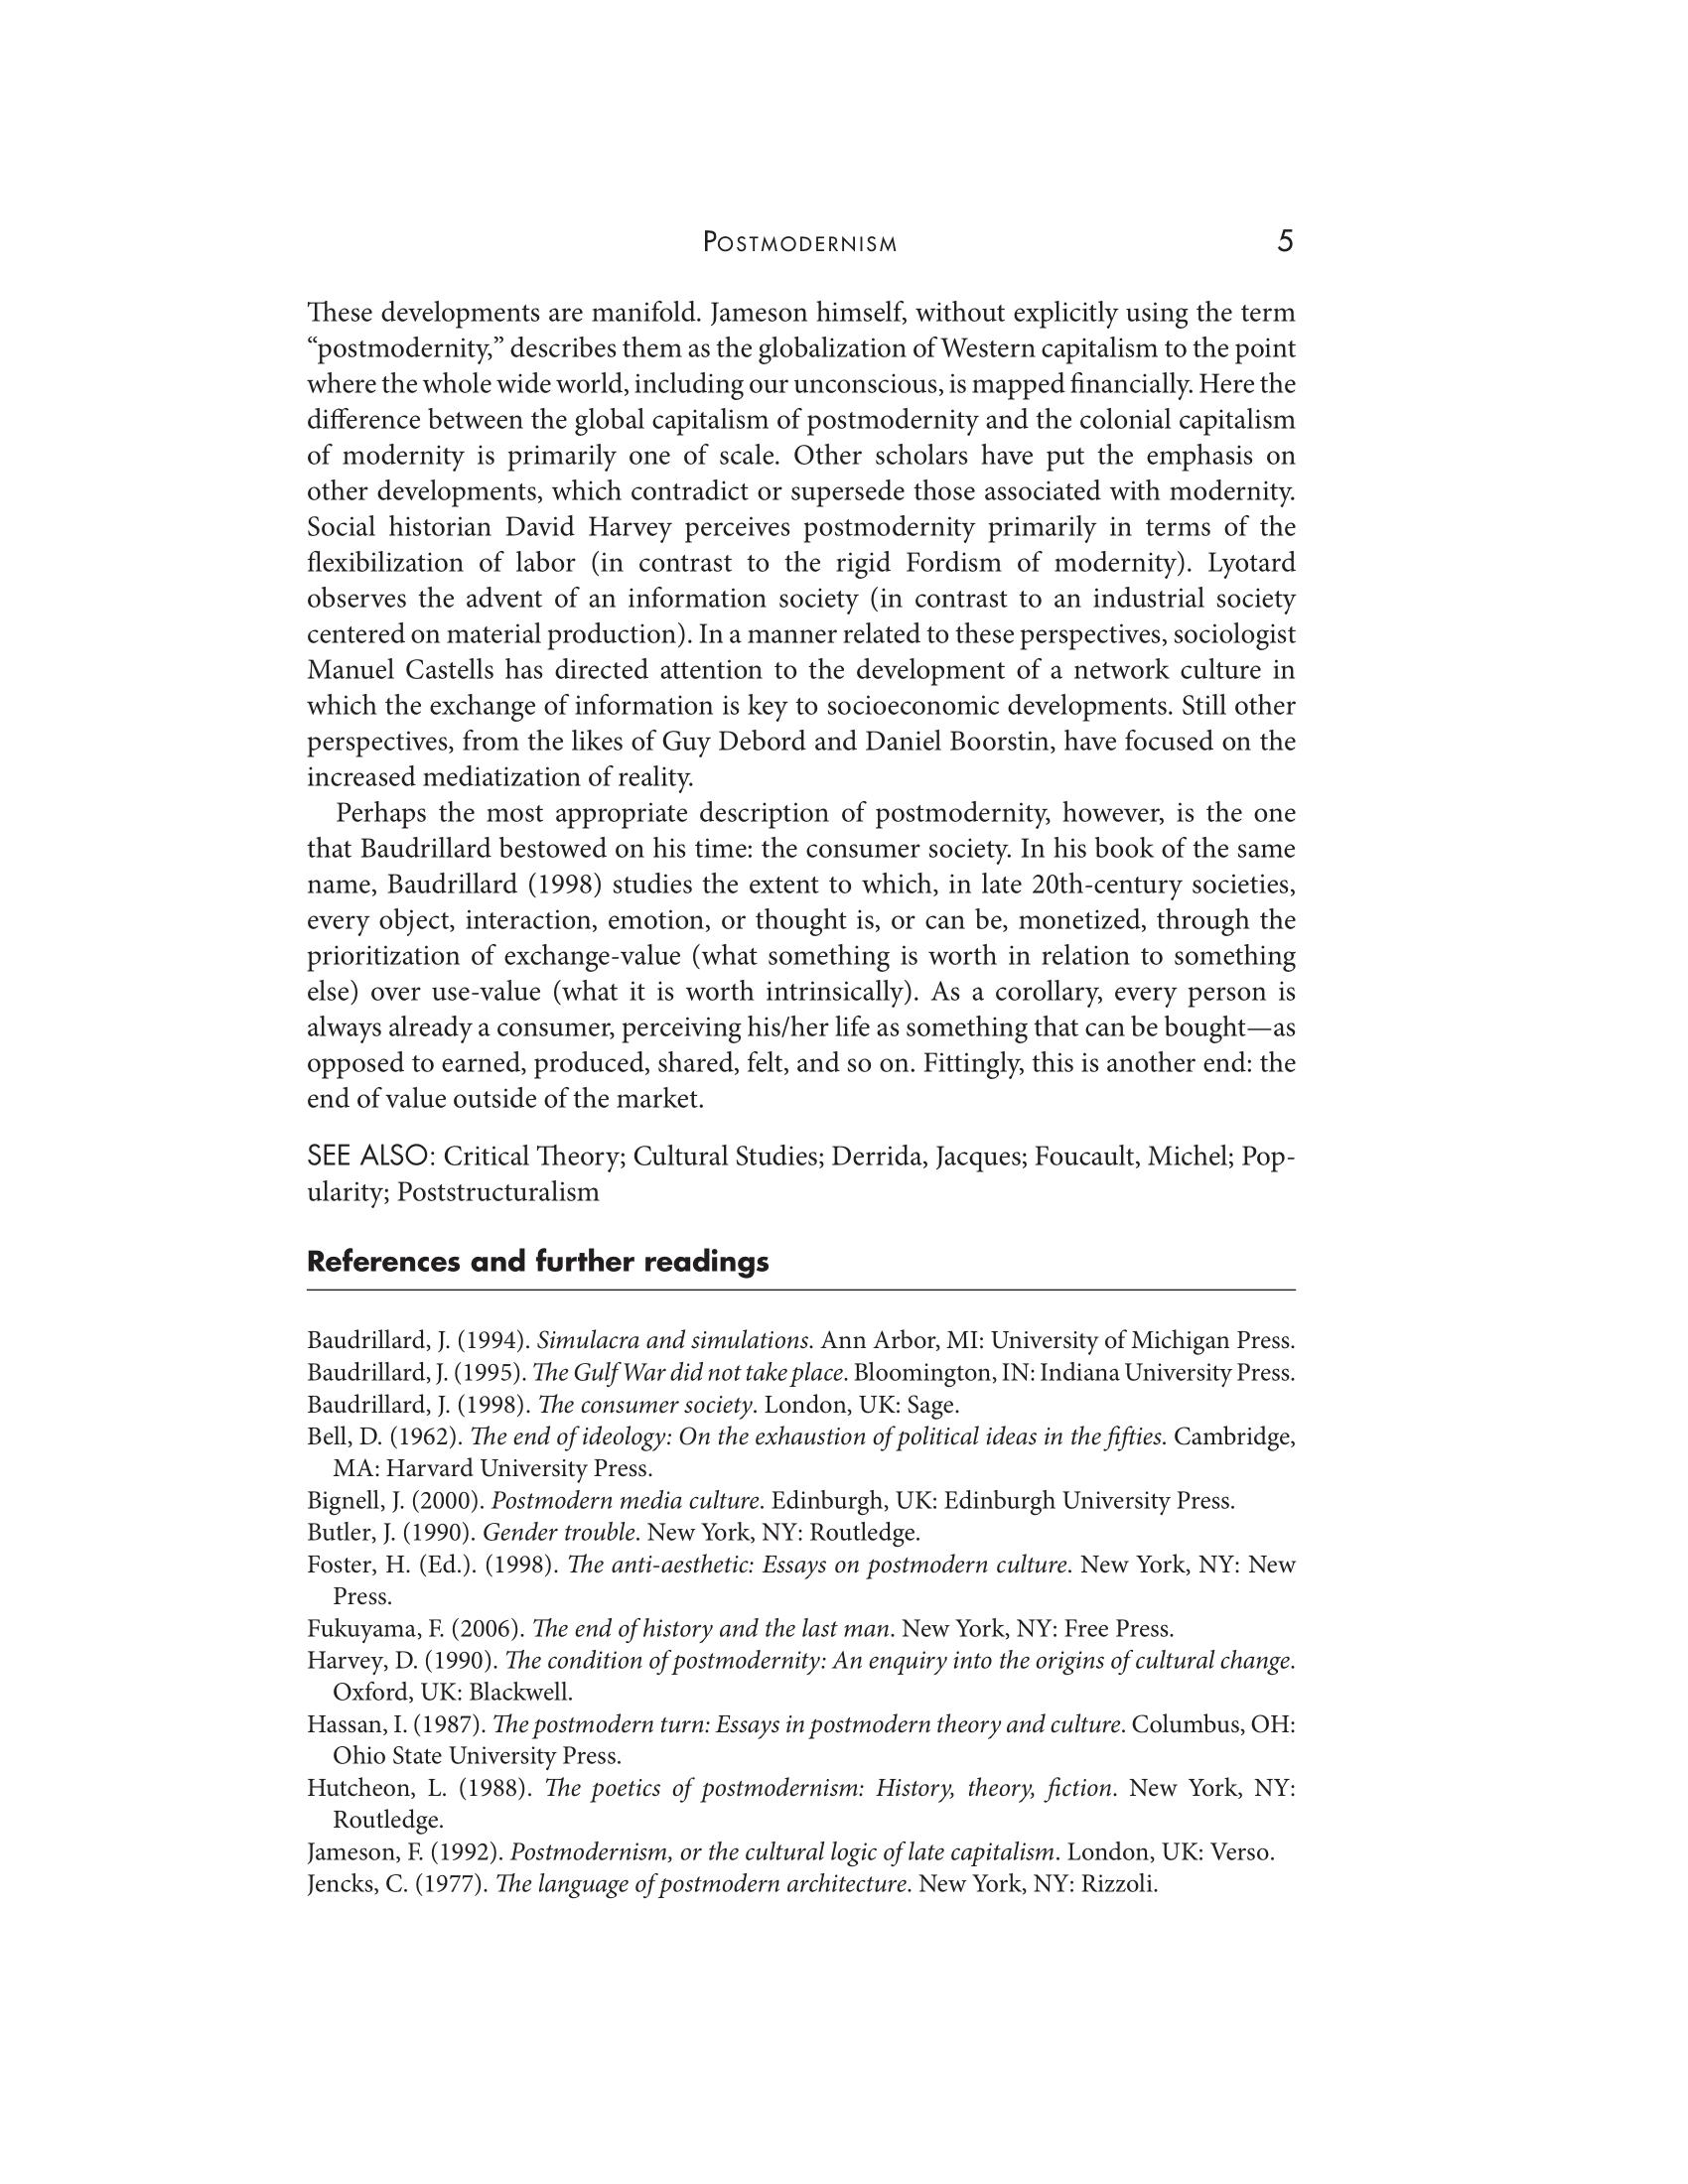 Postmodernism-5.png